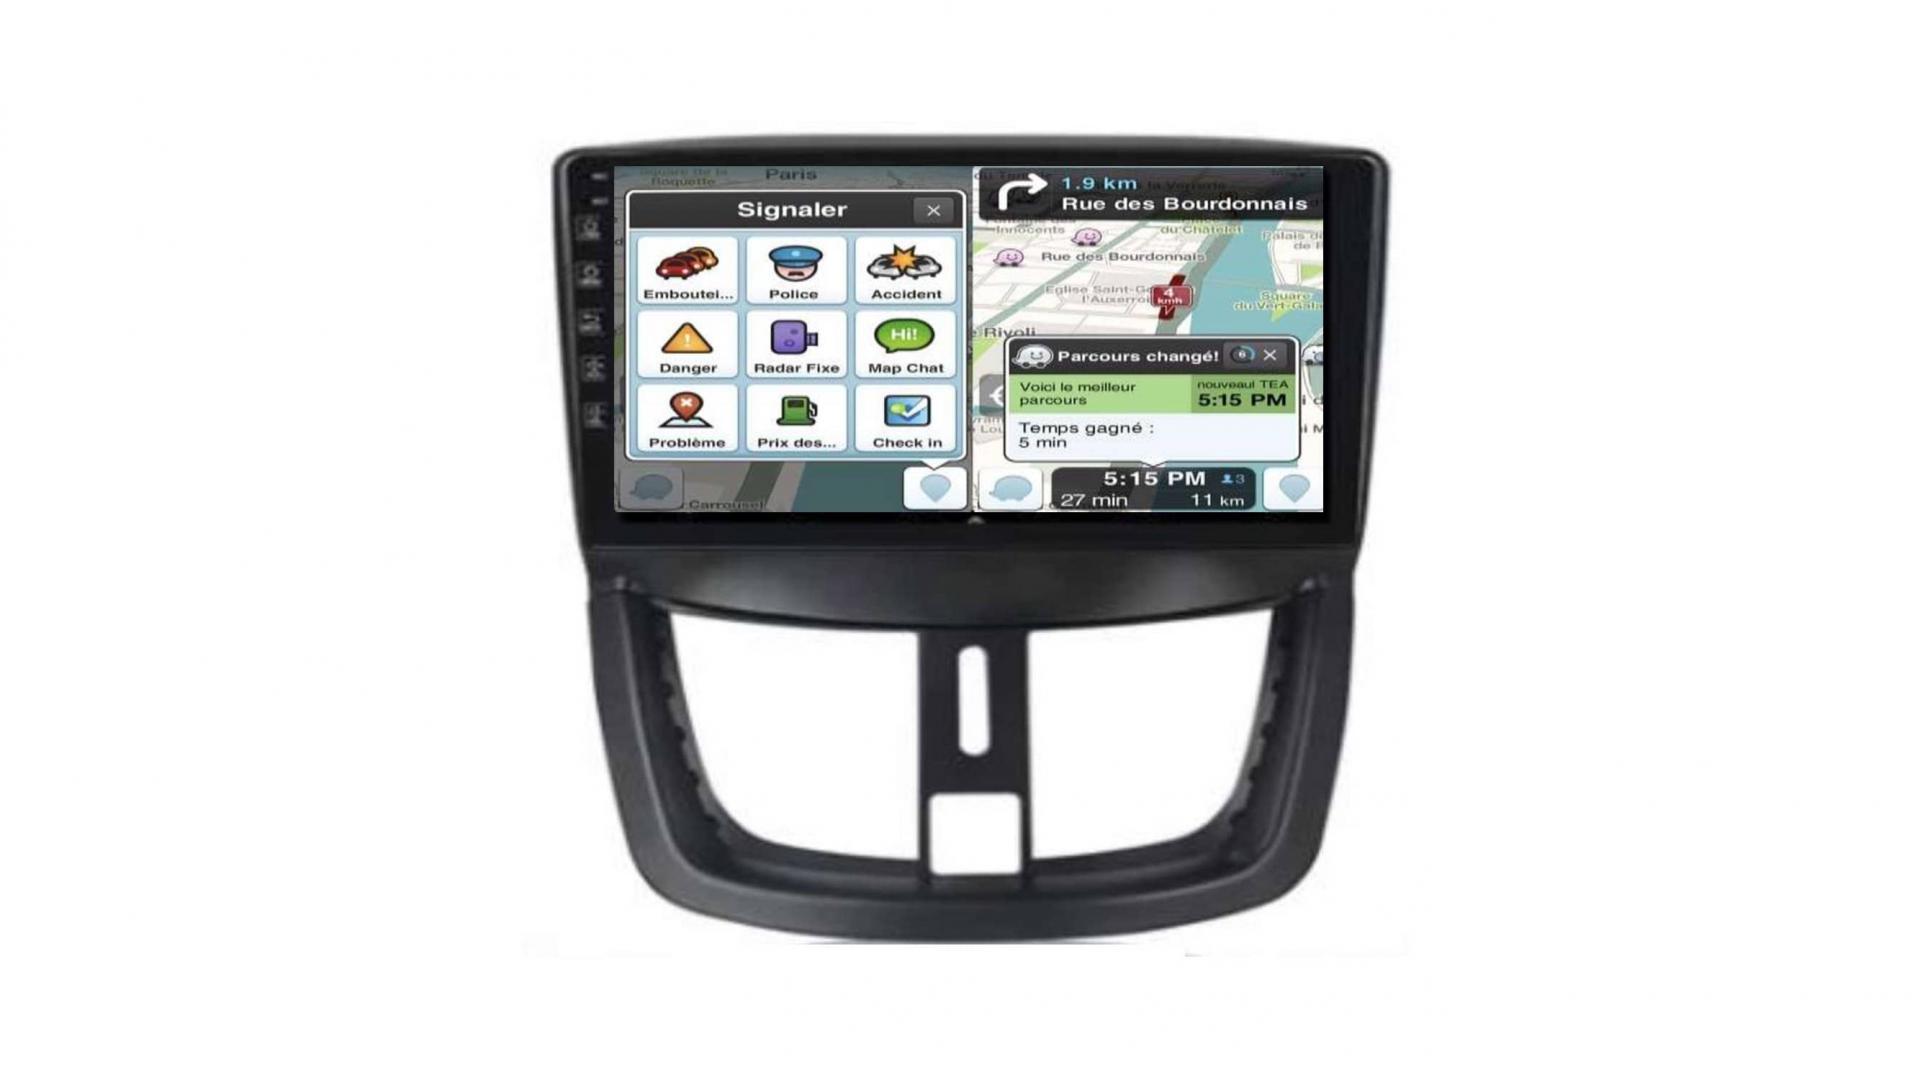 Peugeot 206 207 3008 5008 408 rcz autoradio gps bluetooth android auto carplay camera de recul commande au volant5